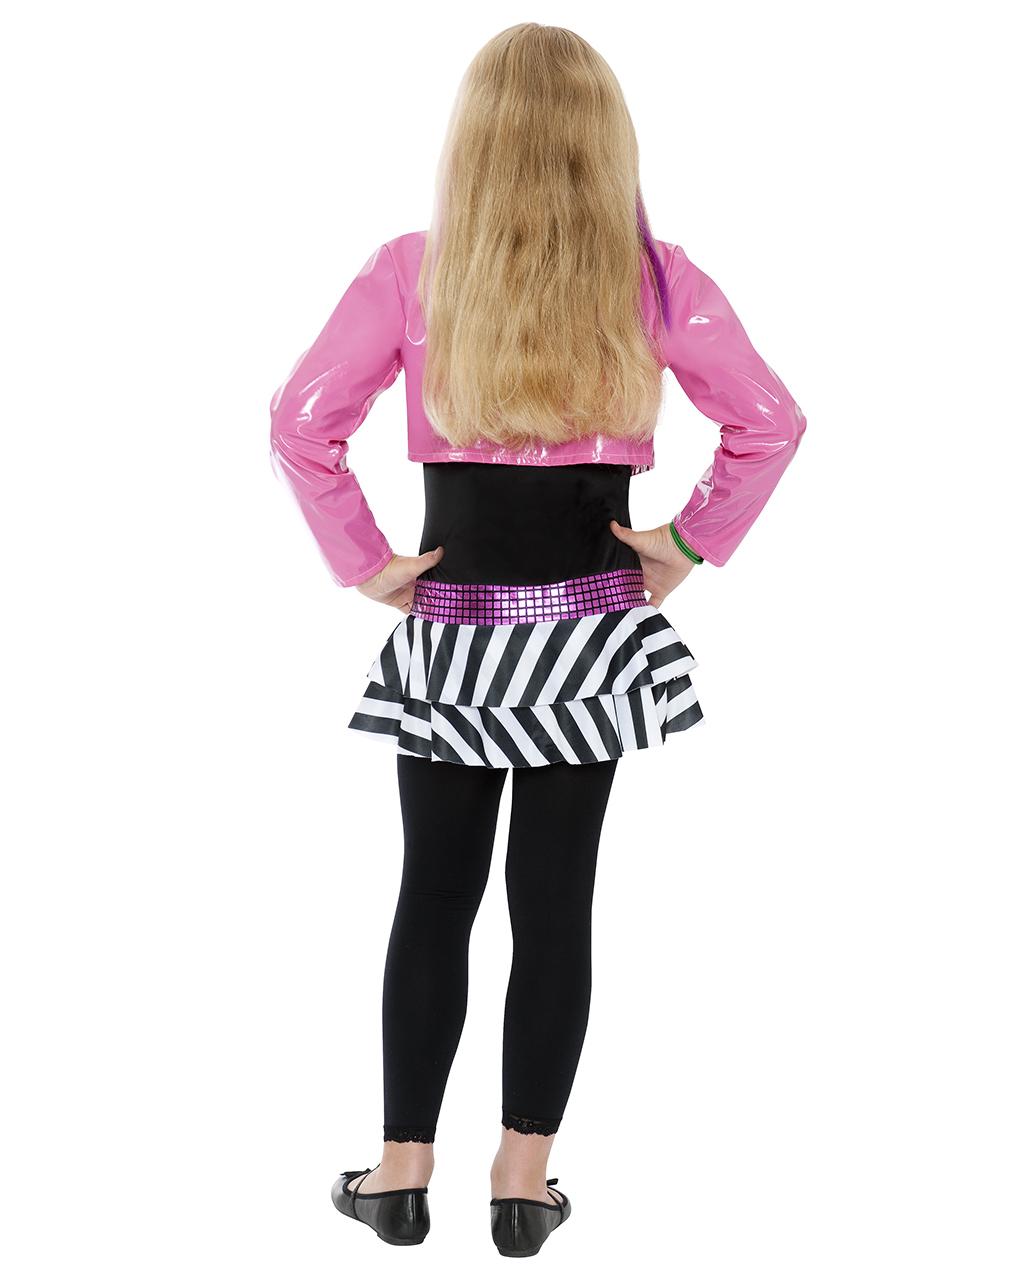 mini rockstar kost m f r m dchen kinder faschings verkleidung karneval universe. Black Bedroom Furniture Sets. Home Design Ideas